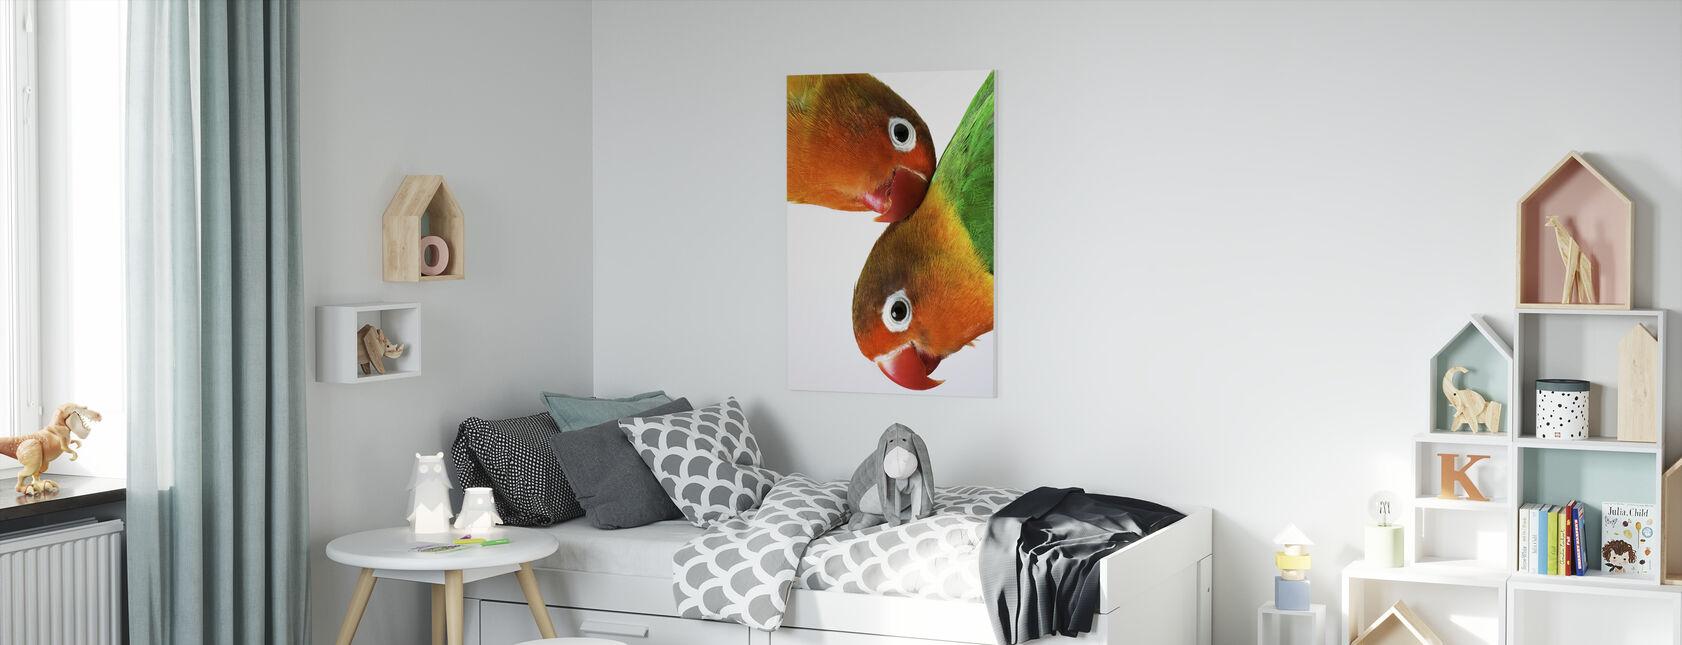 Pair of Lovebirds - Canvas print - Kids Room